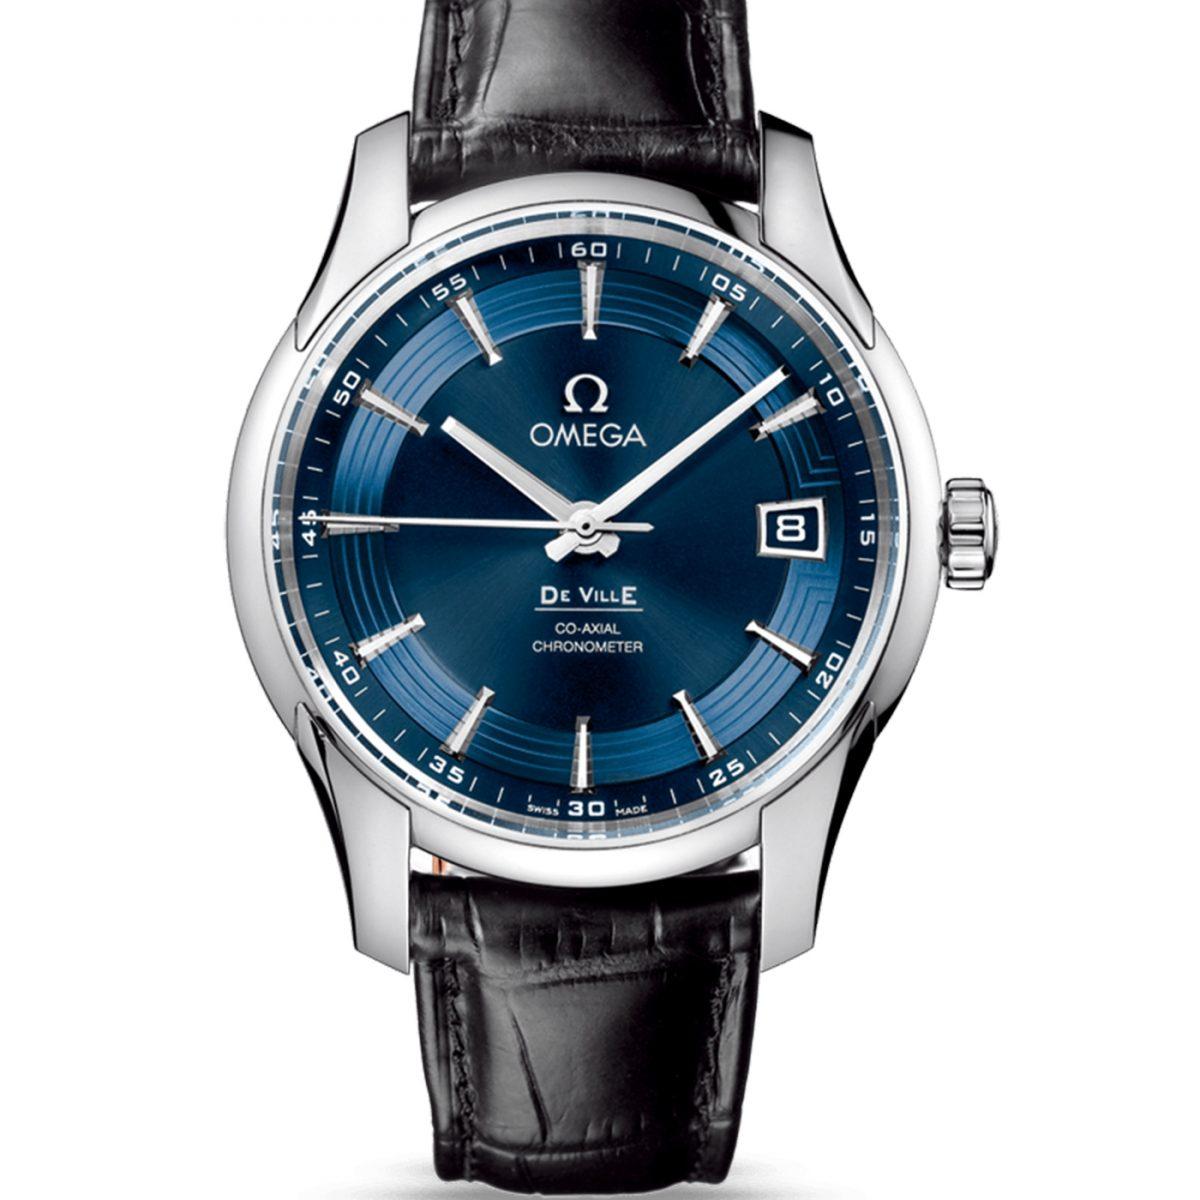 UK Replica Omega De Ville Watches With Elegant Appearance Design